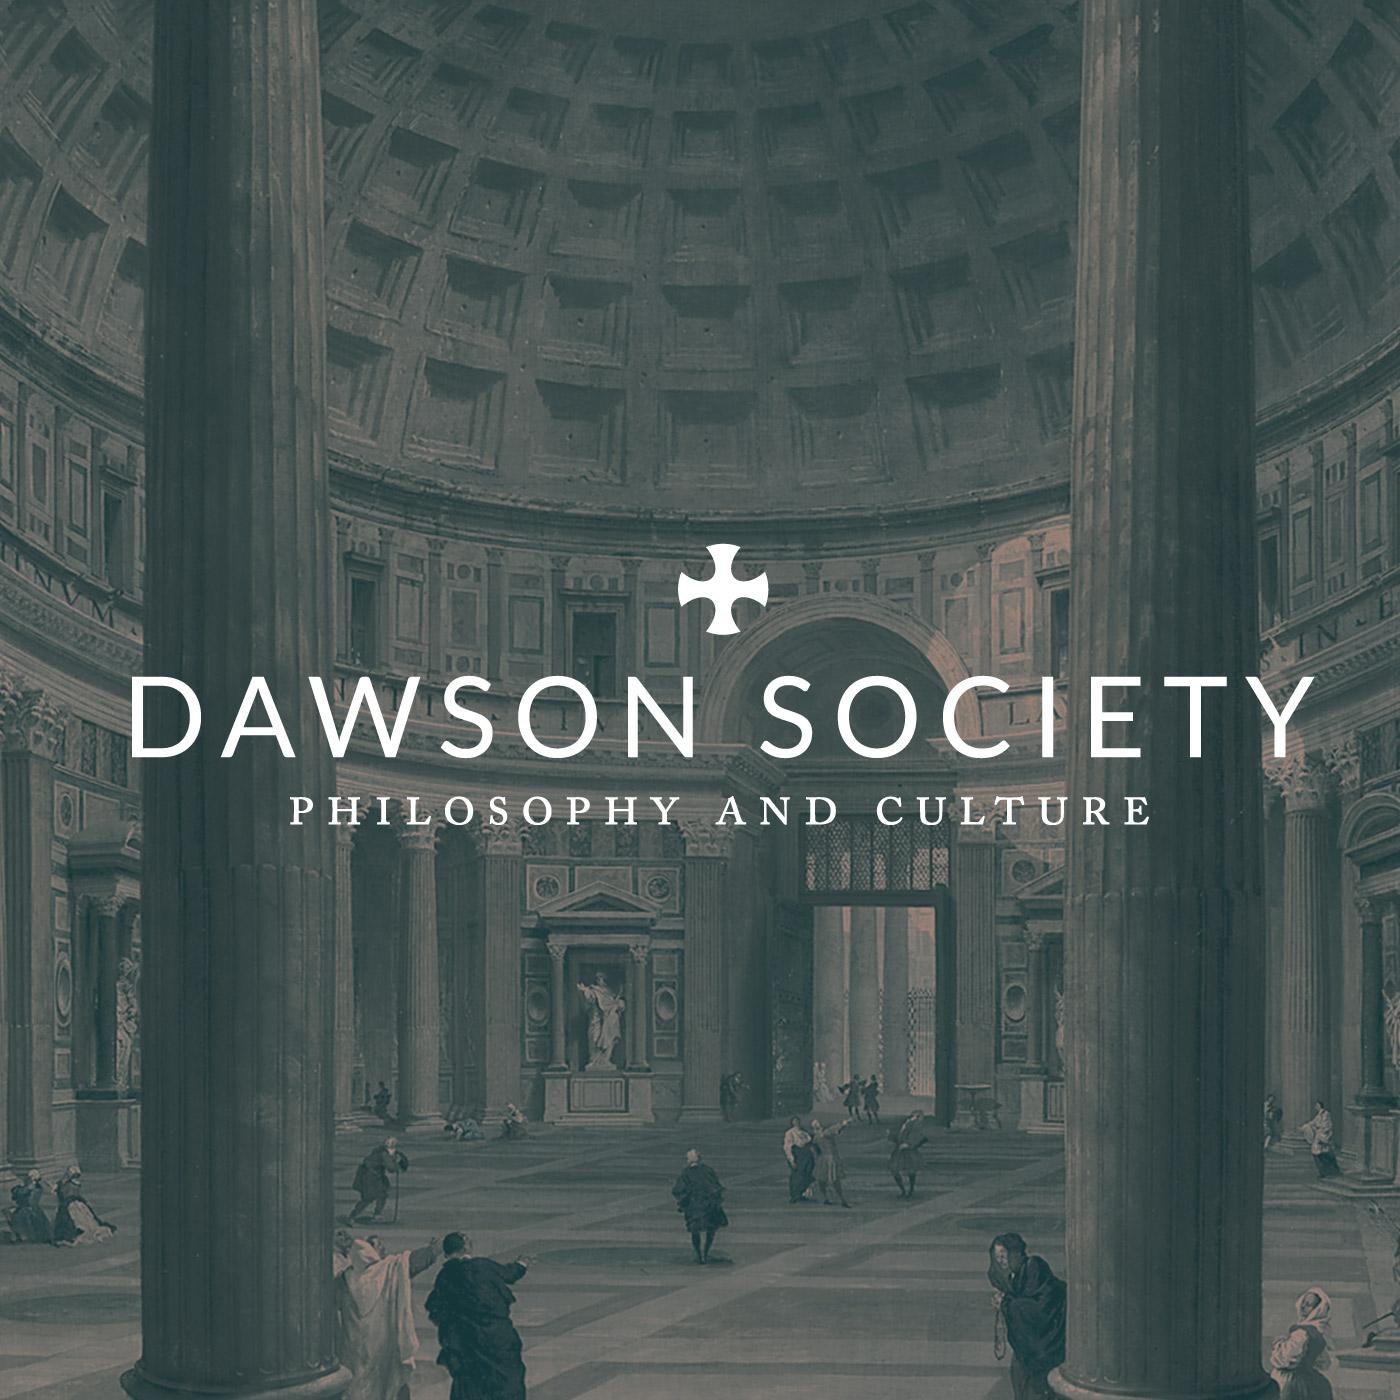 Christopher Dawson Society - Audio Library